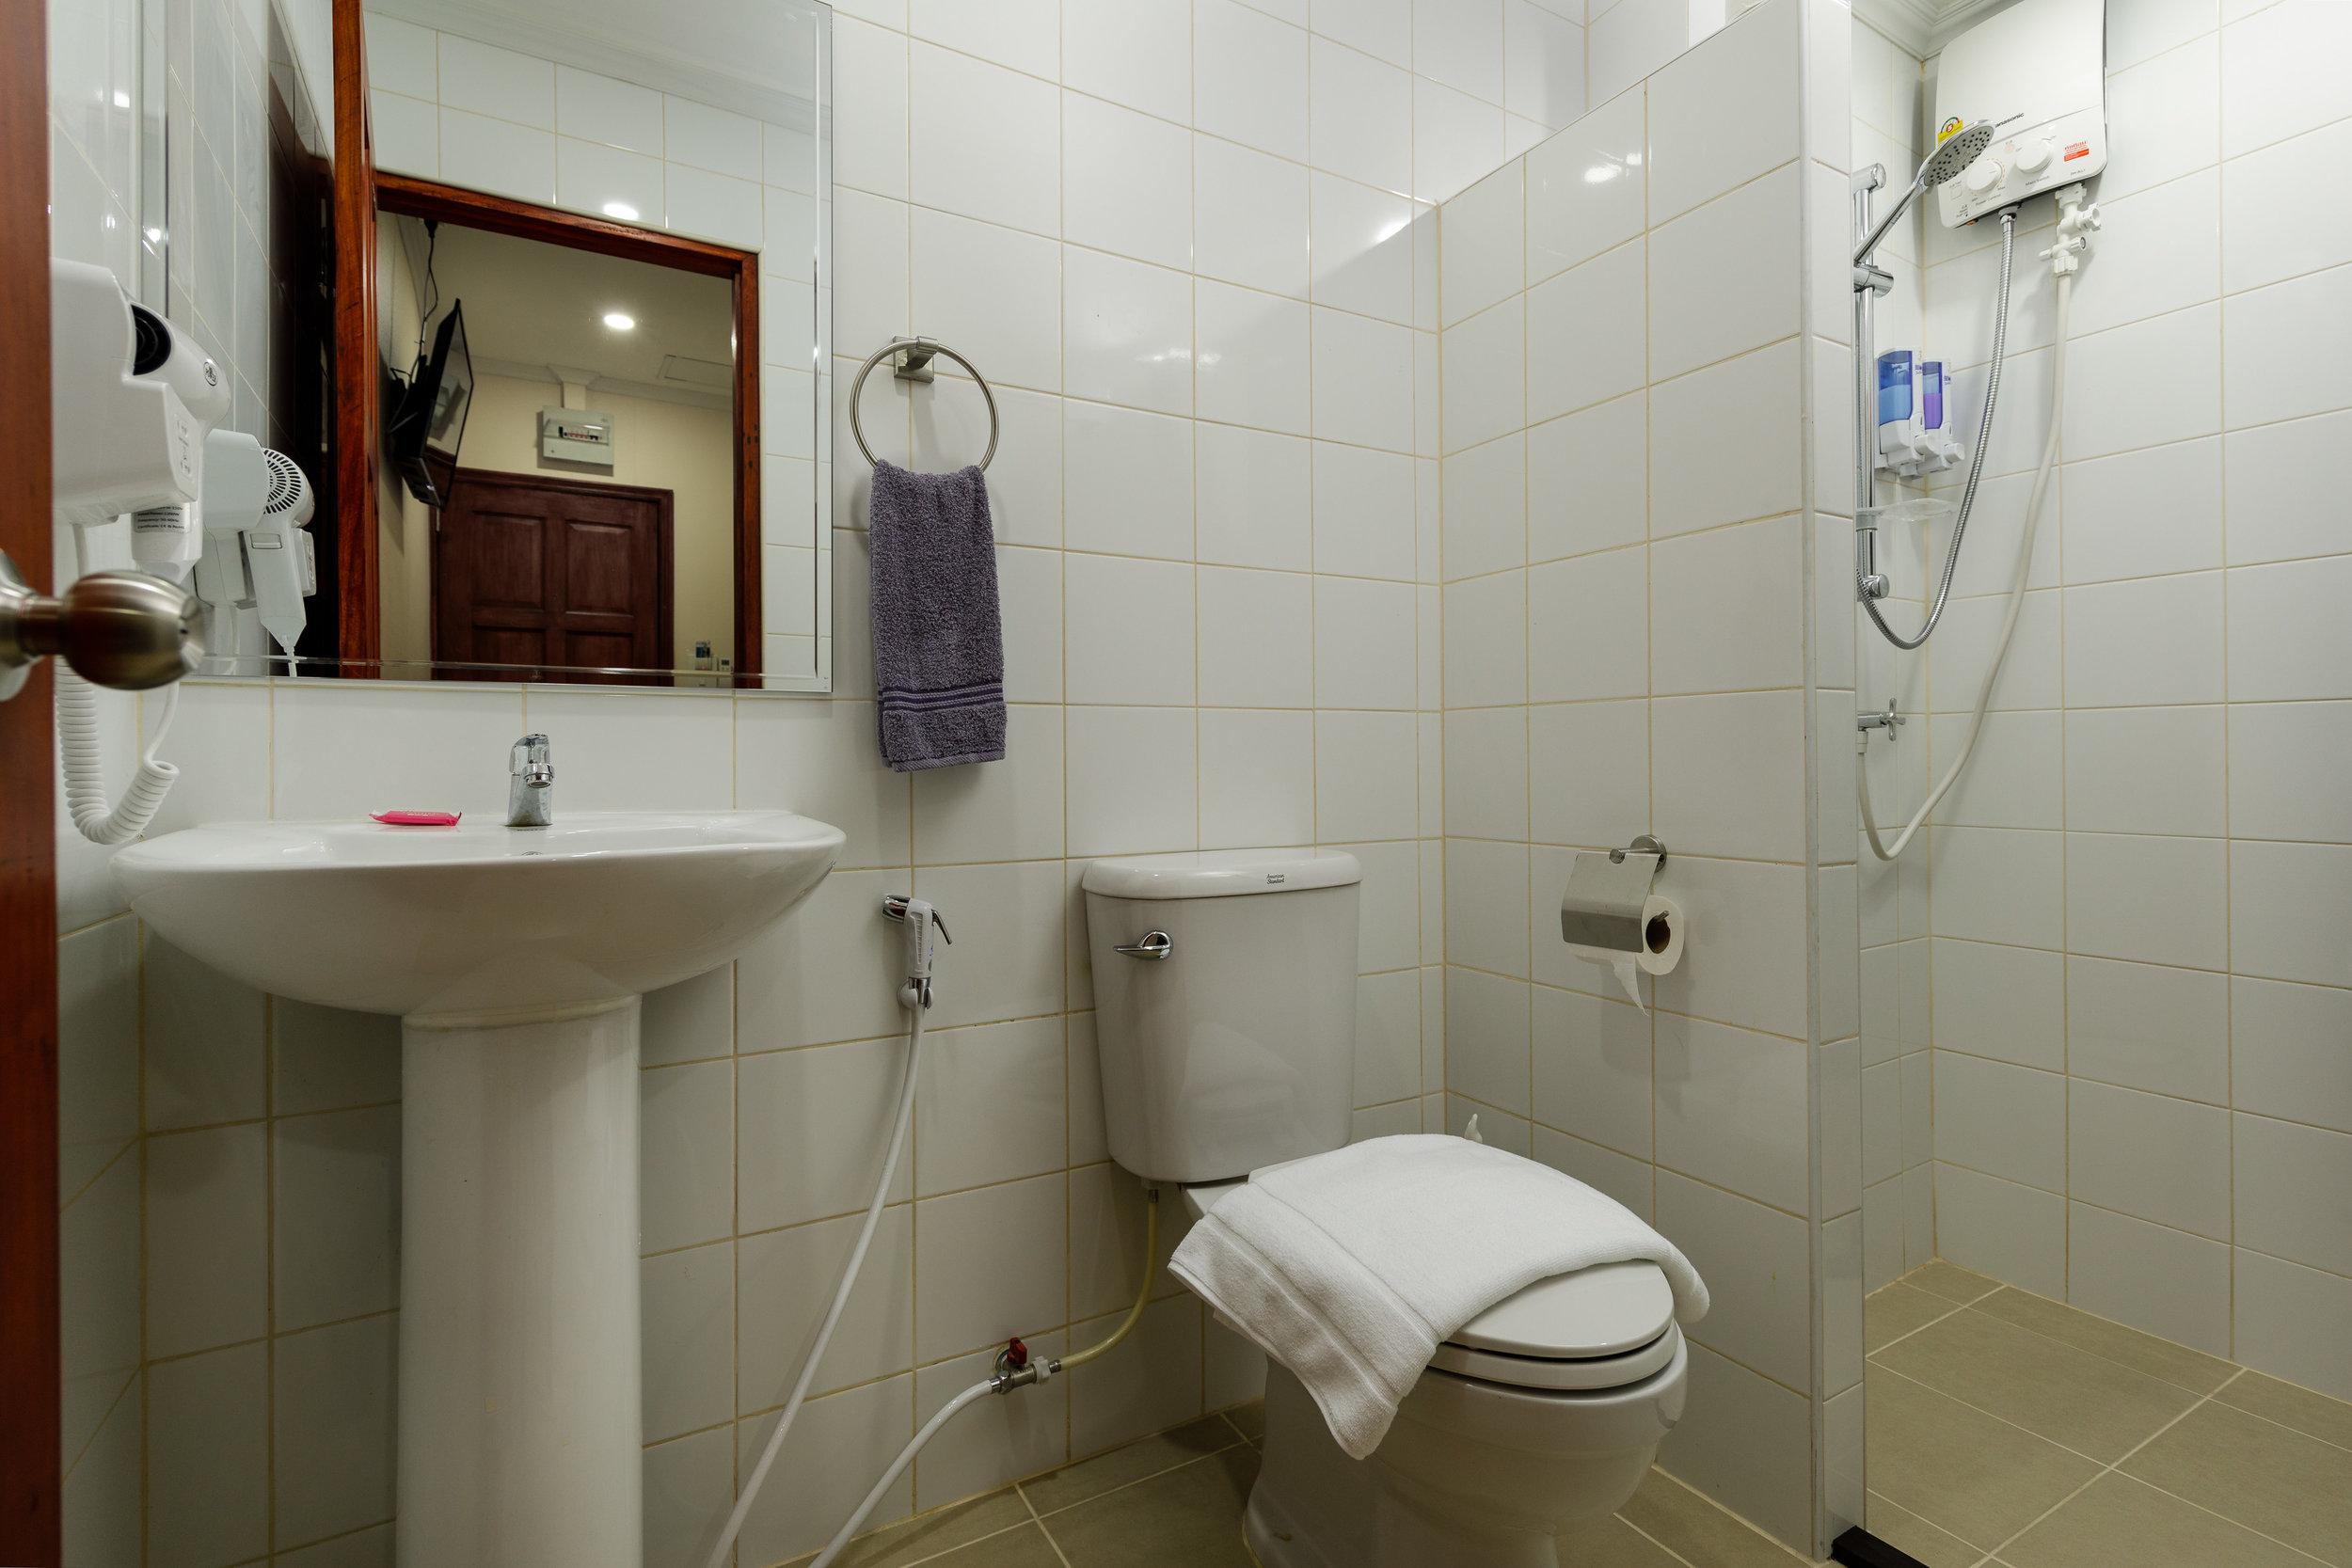 Shower Room Bathroom